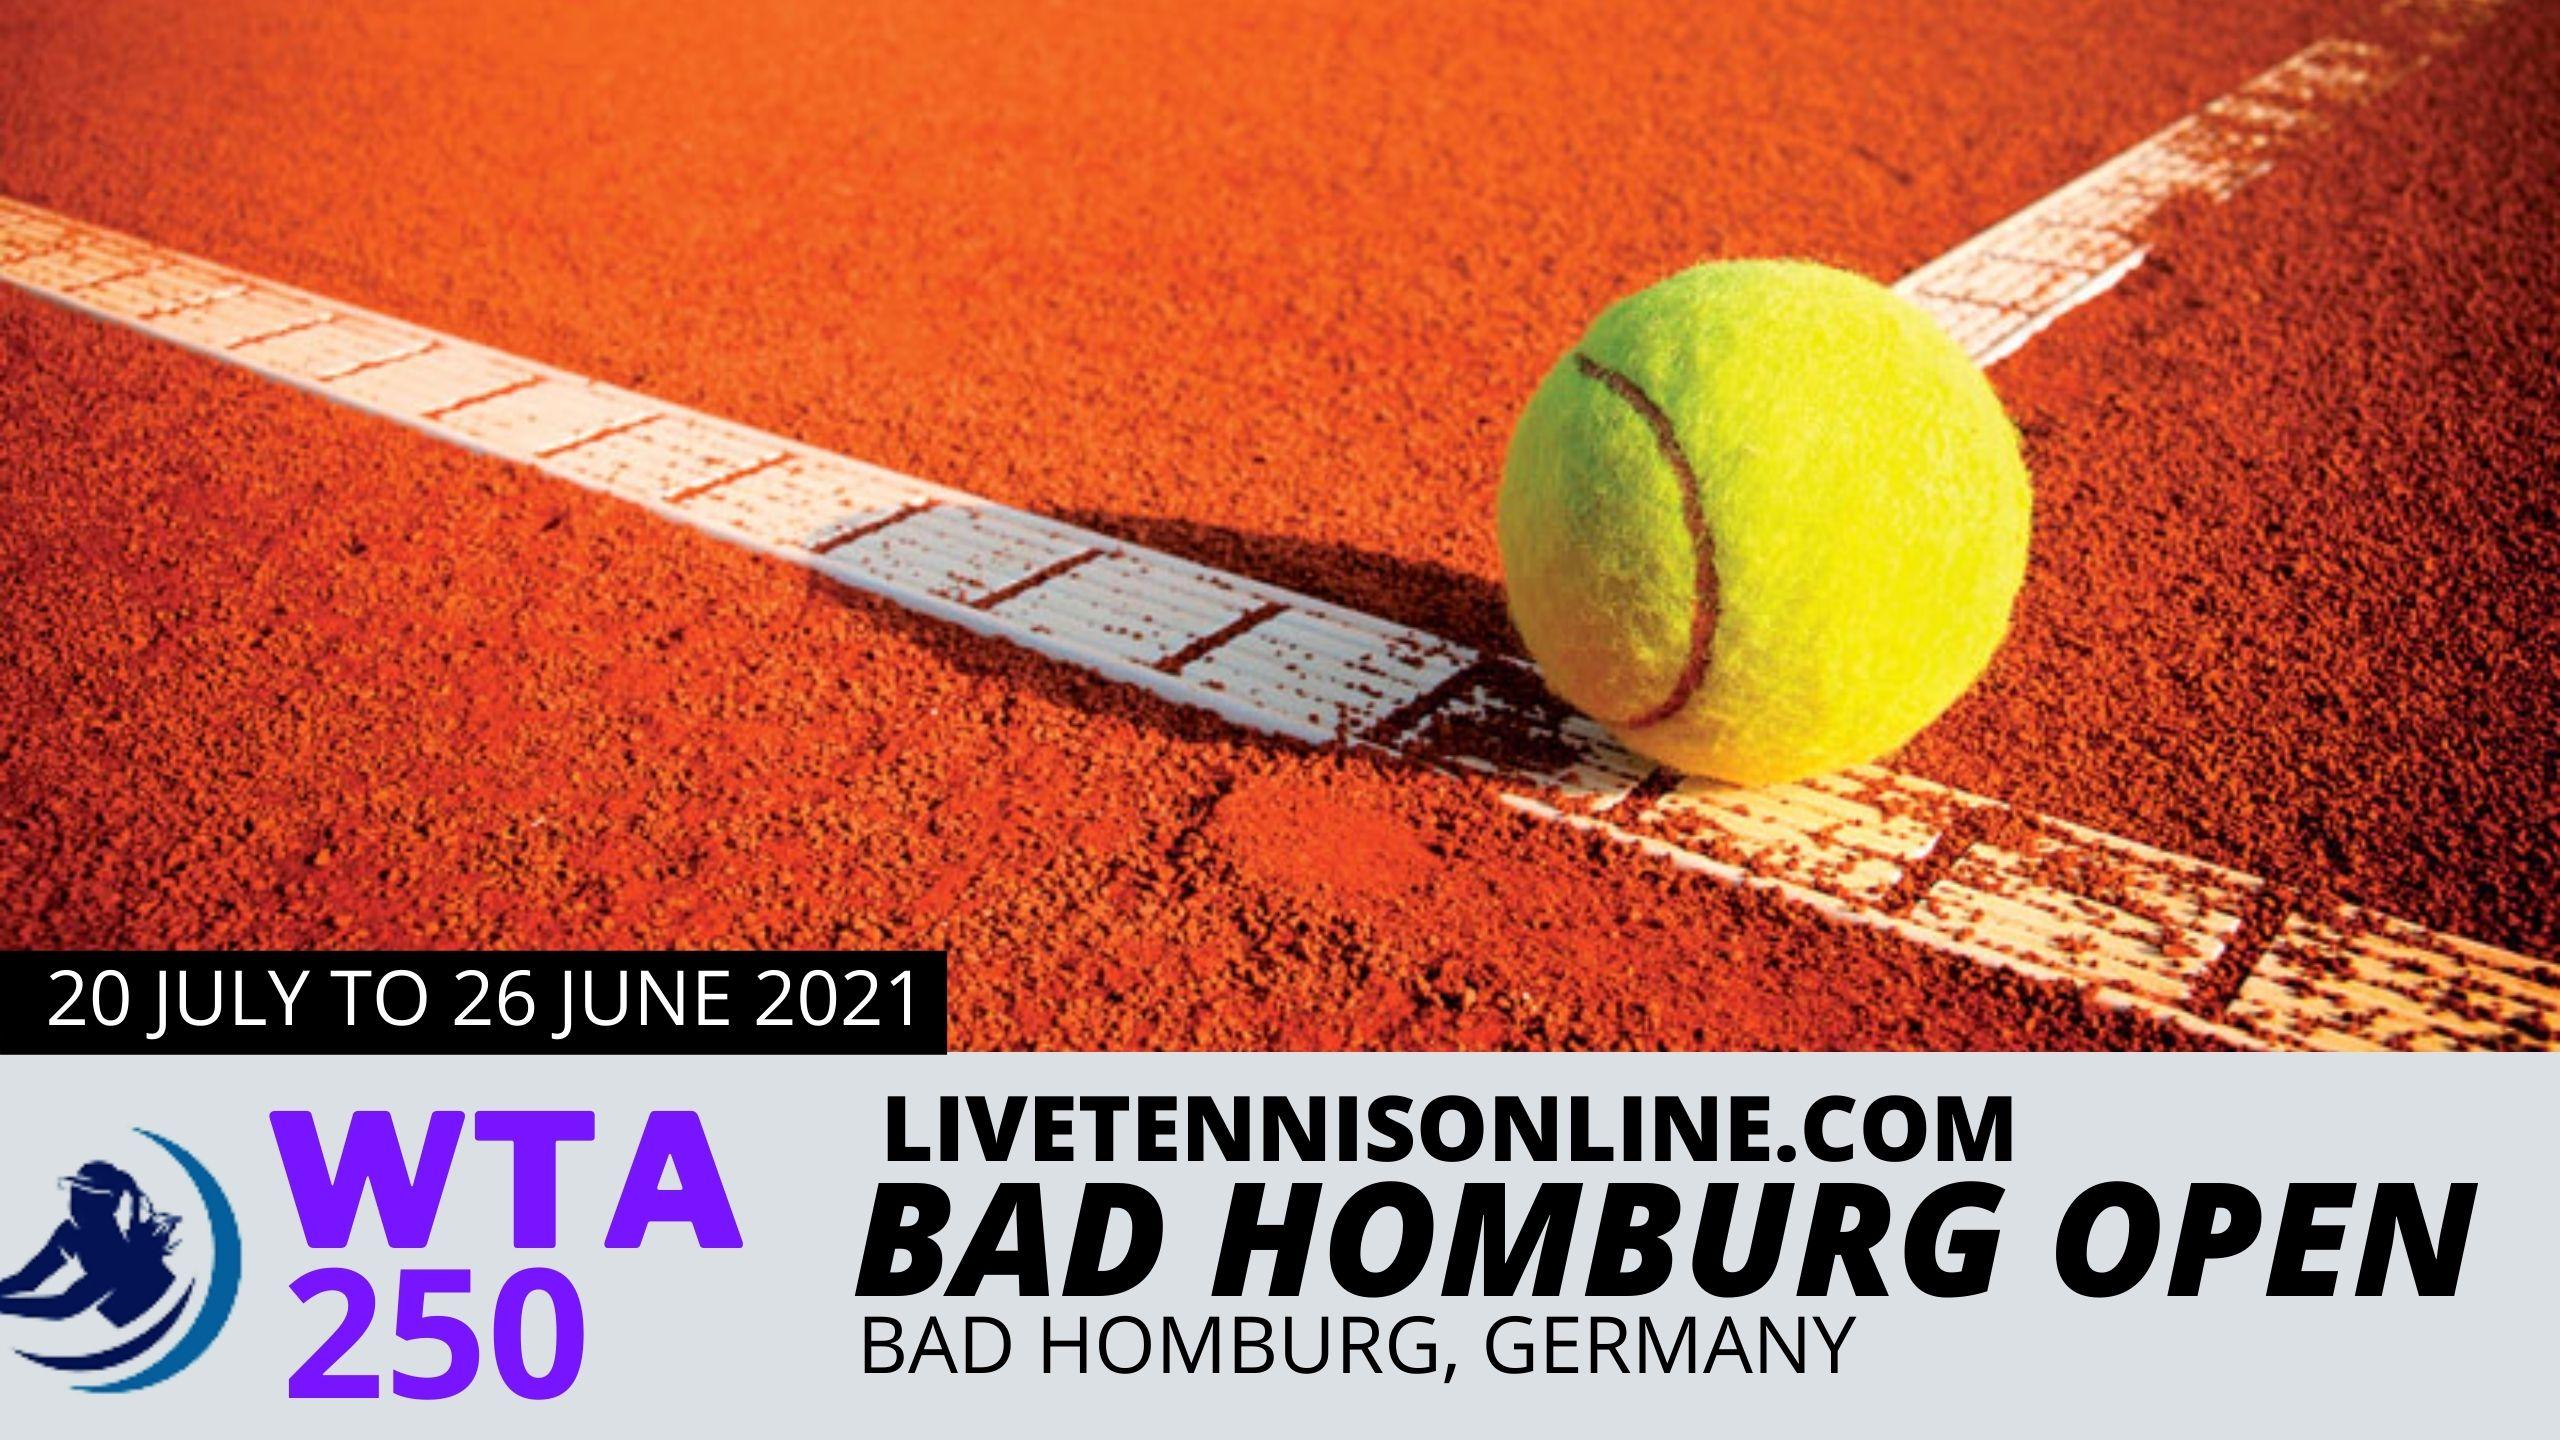 Bad Homburg Open Live Streaming